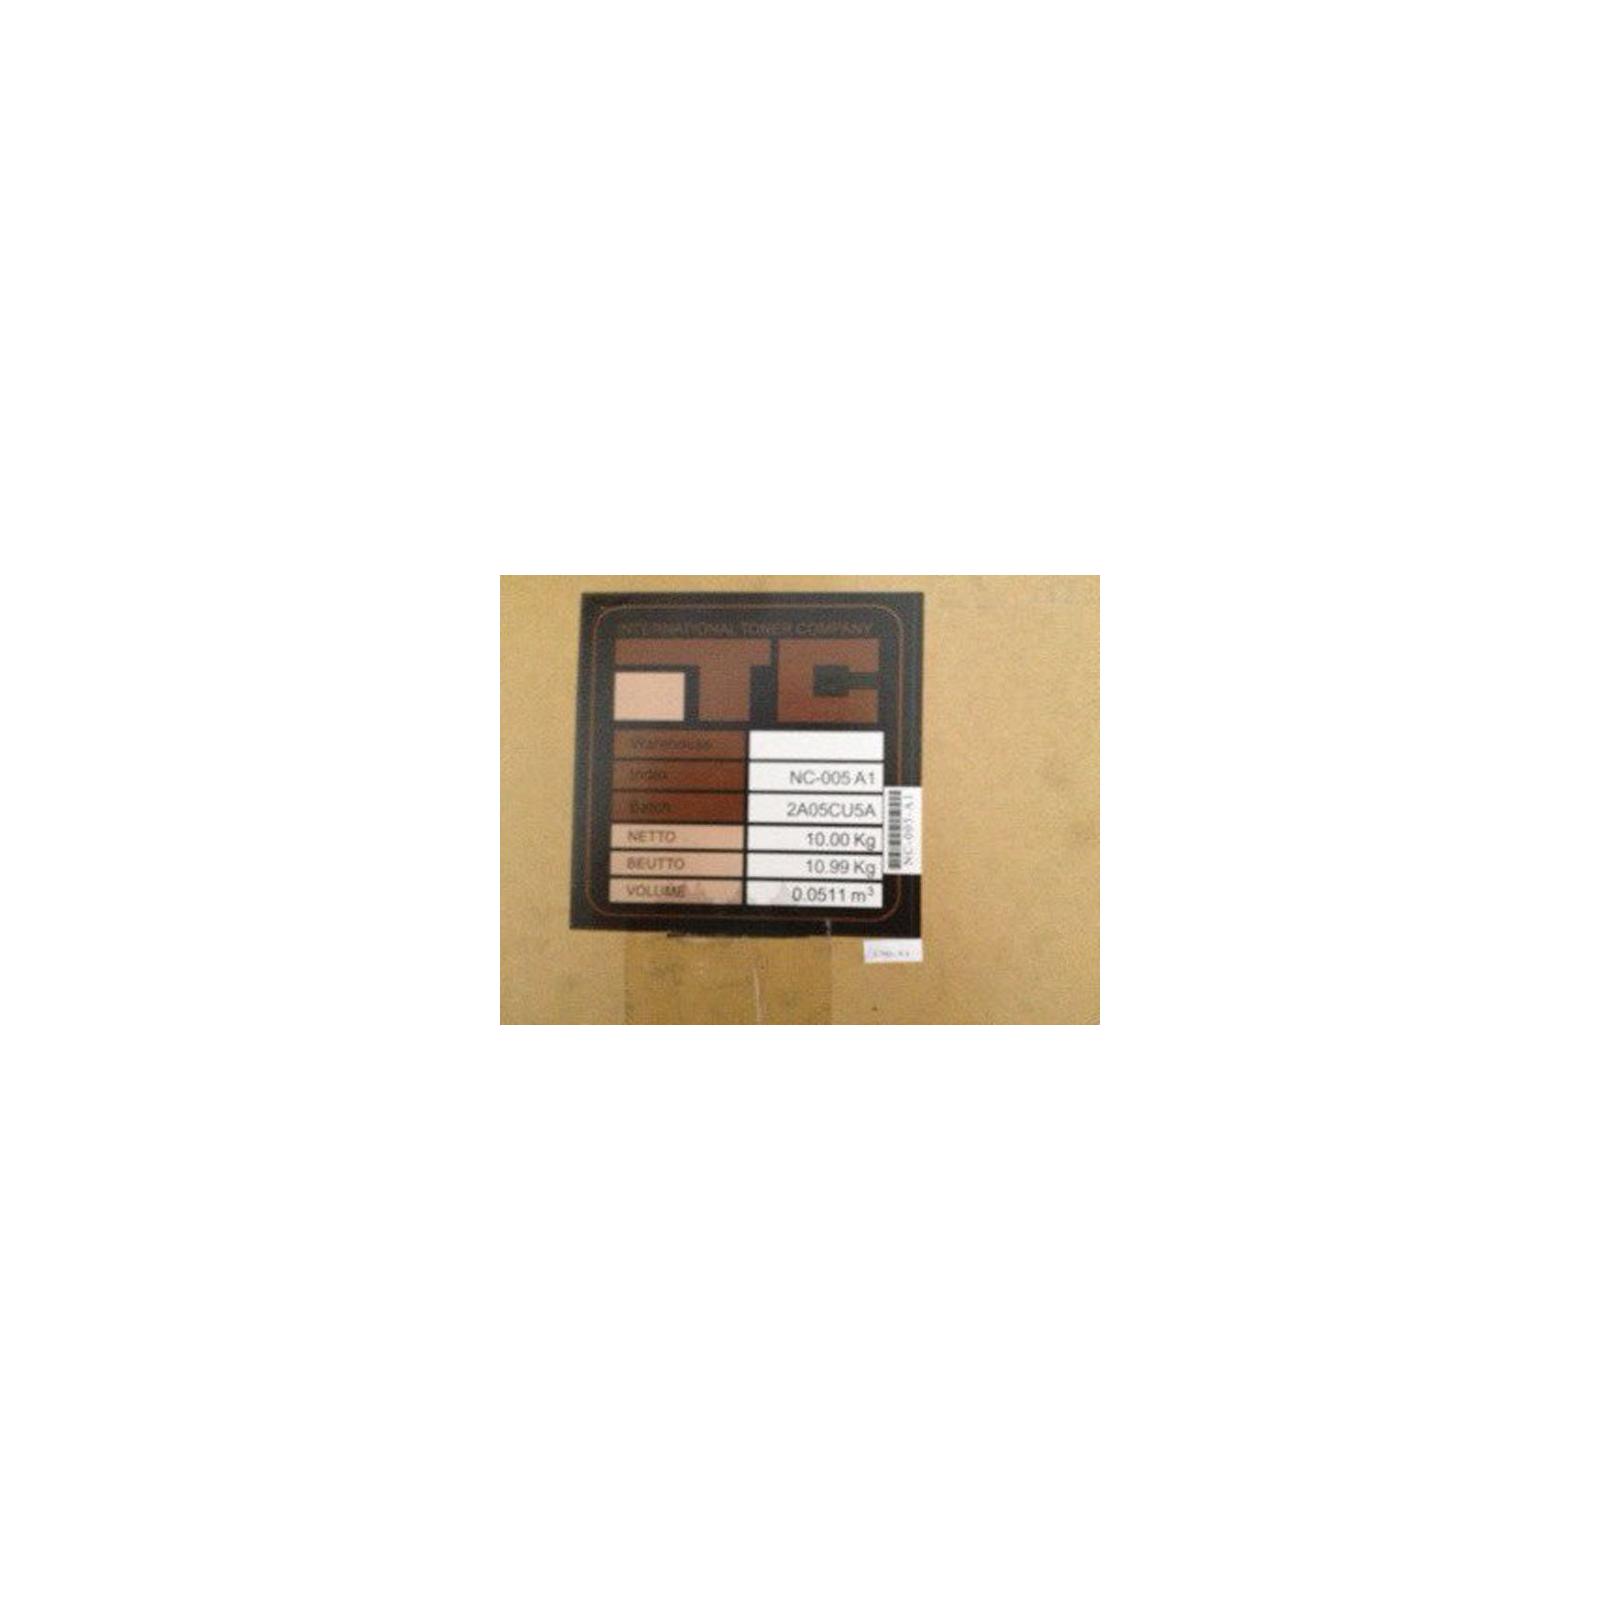 Тонер TTI HP CLJ CP3530/3525 Yellow T721-1 (NC-005.A1)